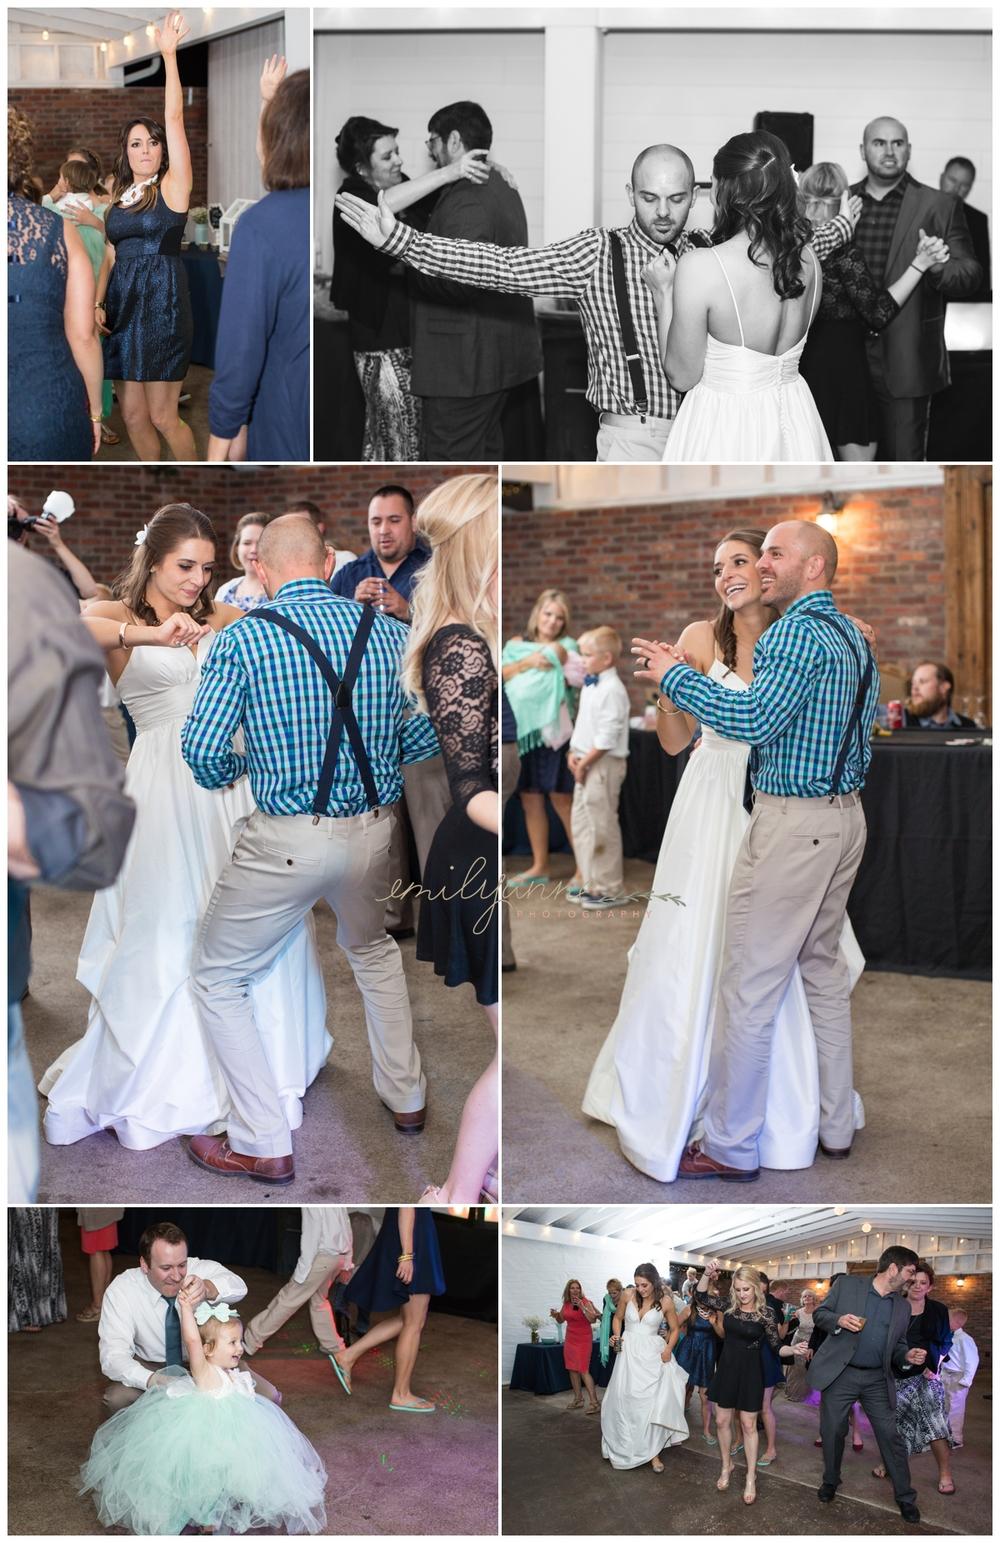 Ralston's+Crossing+Wedding+--+www.emilyanne-photography-10.jpg